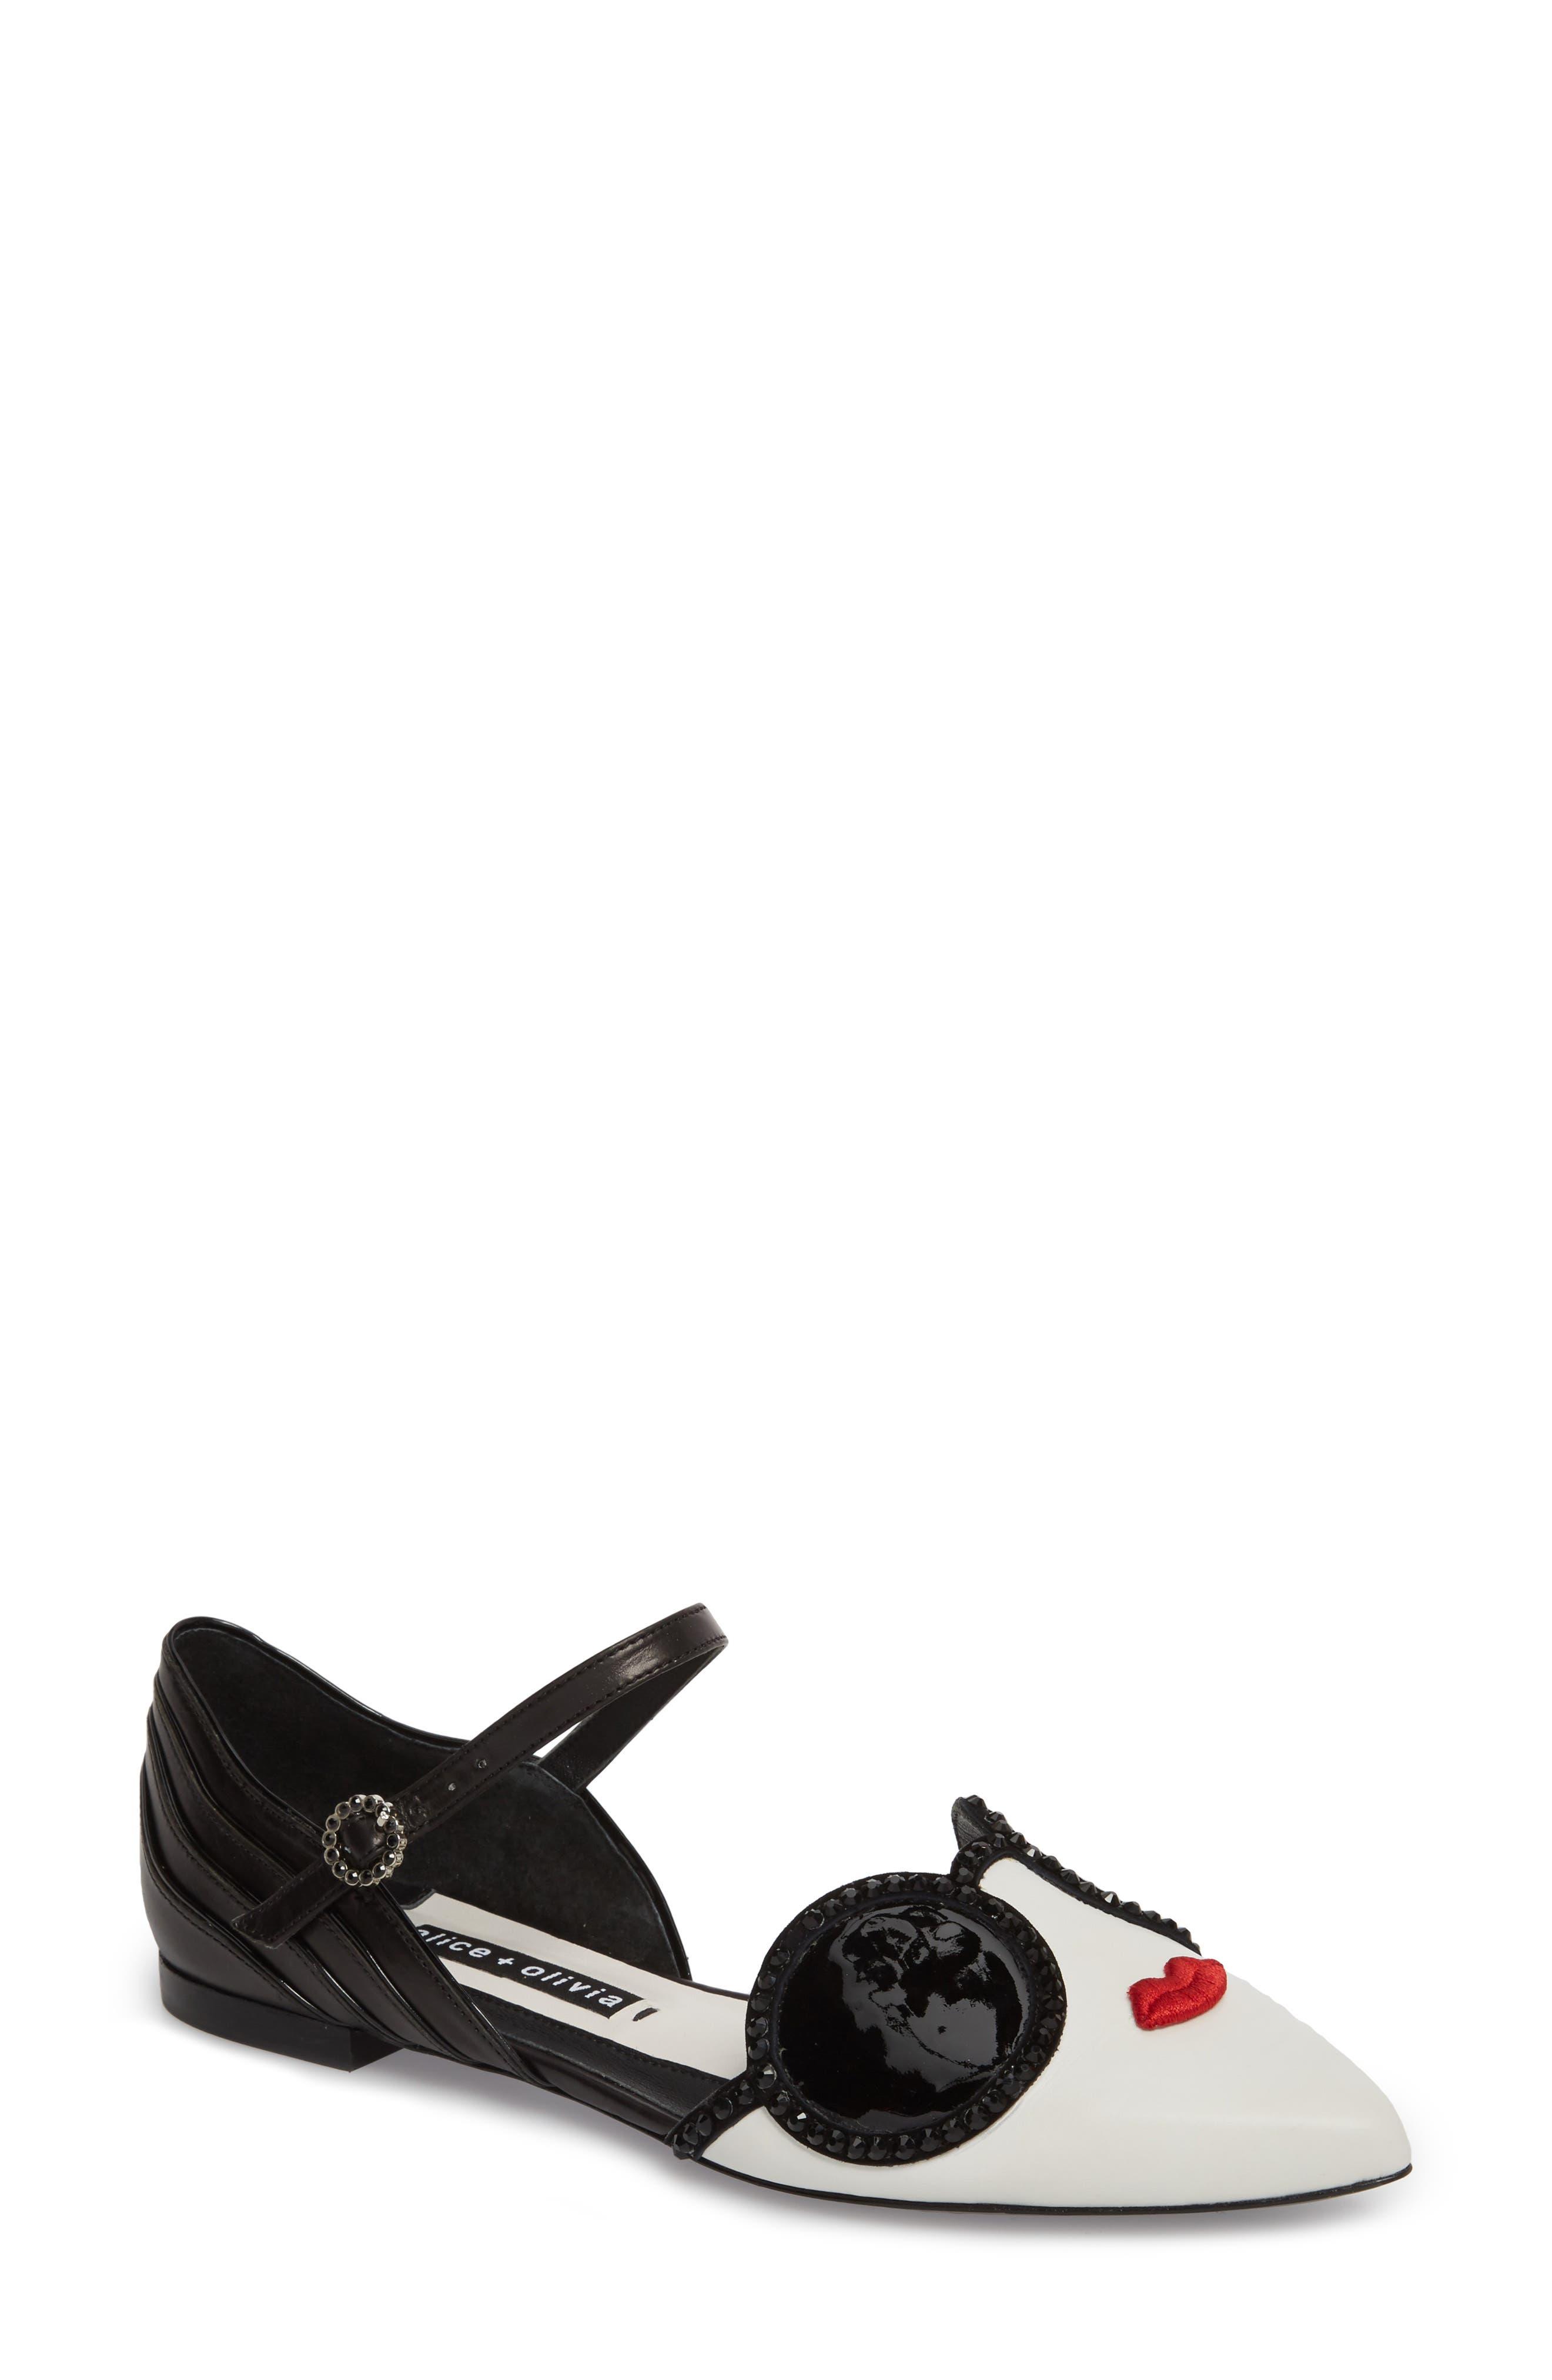 Lexi Embellished Pointy Toe Flat,                             Main thumbnail 1, color,                             Bianco/ Black/ Poppy